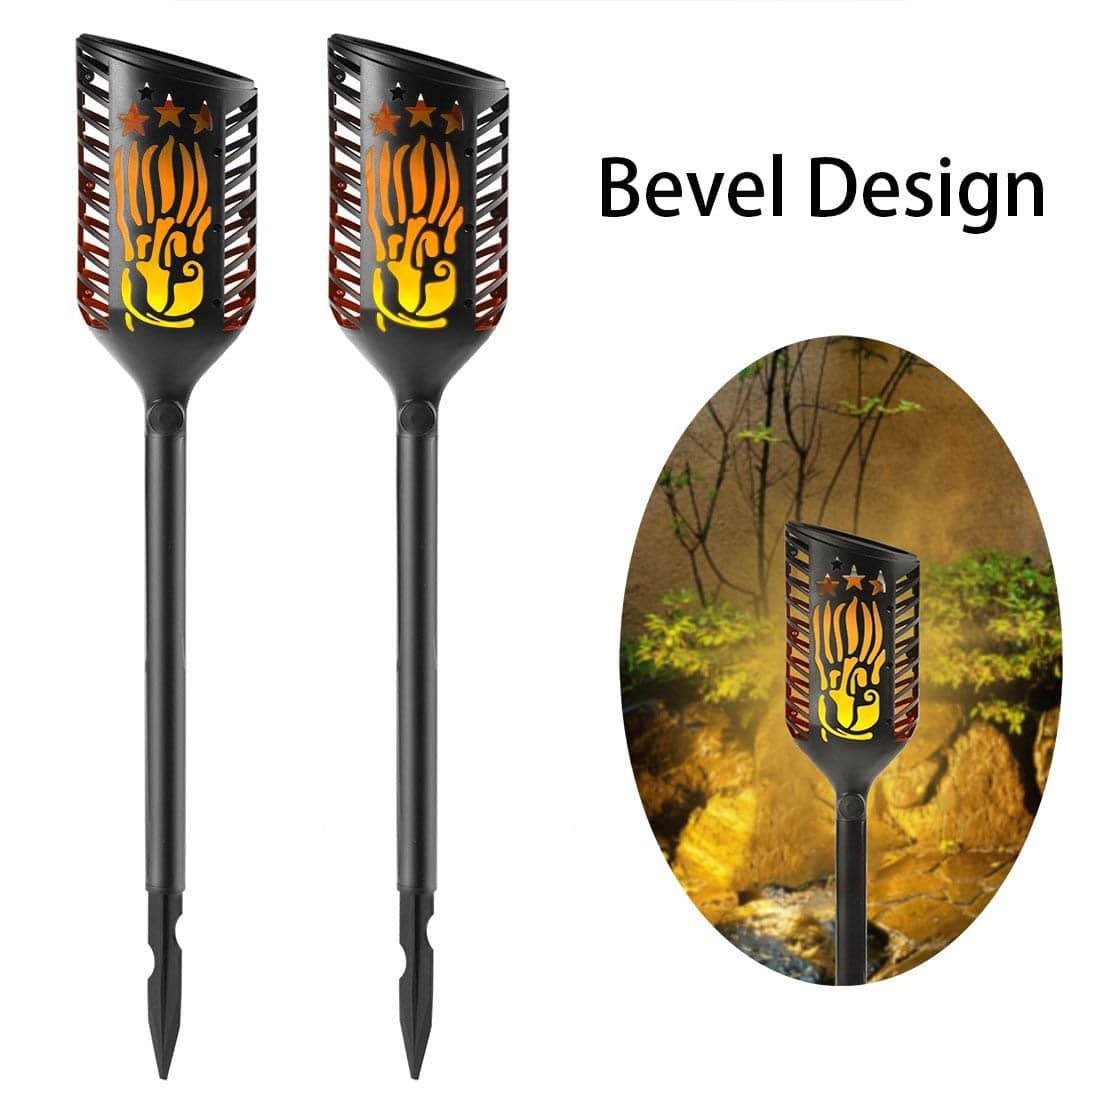 Solar Torch Lights, Anmaker Top Bevel Design Waterproof Flickering Dancing Flame Landscape Light for Patio, Deck, Yard Driveway, Road